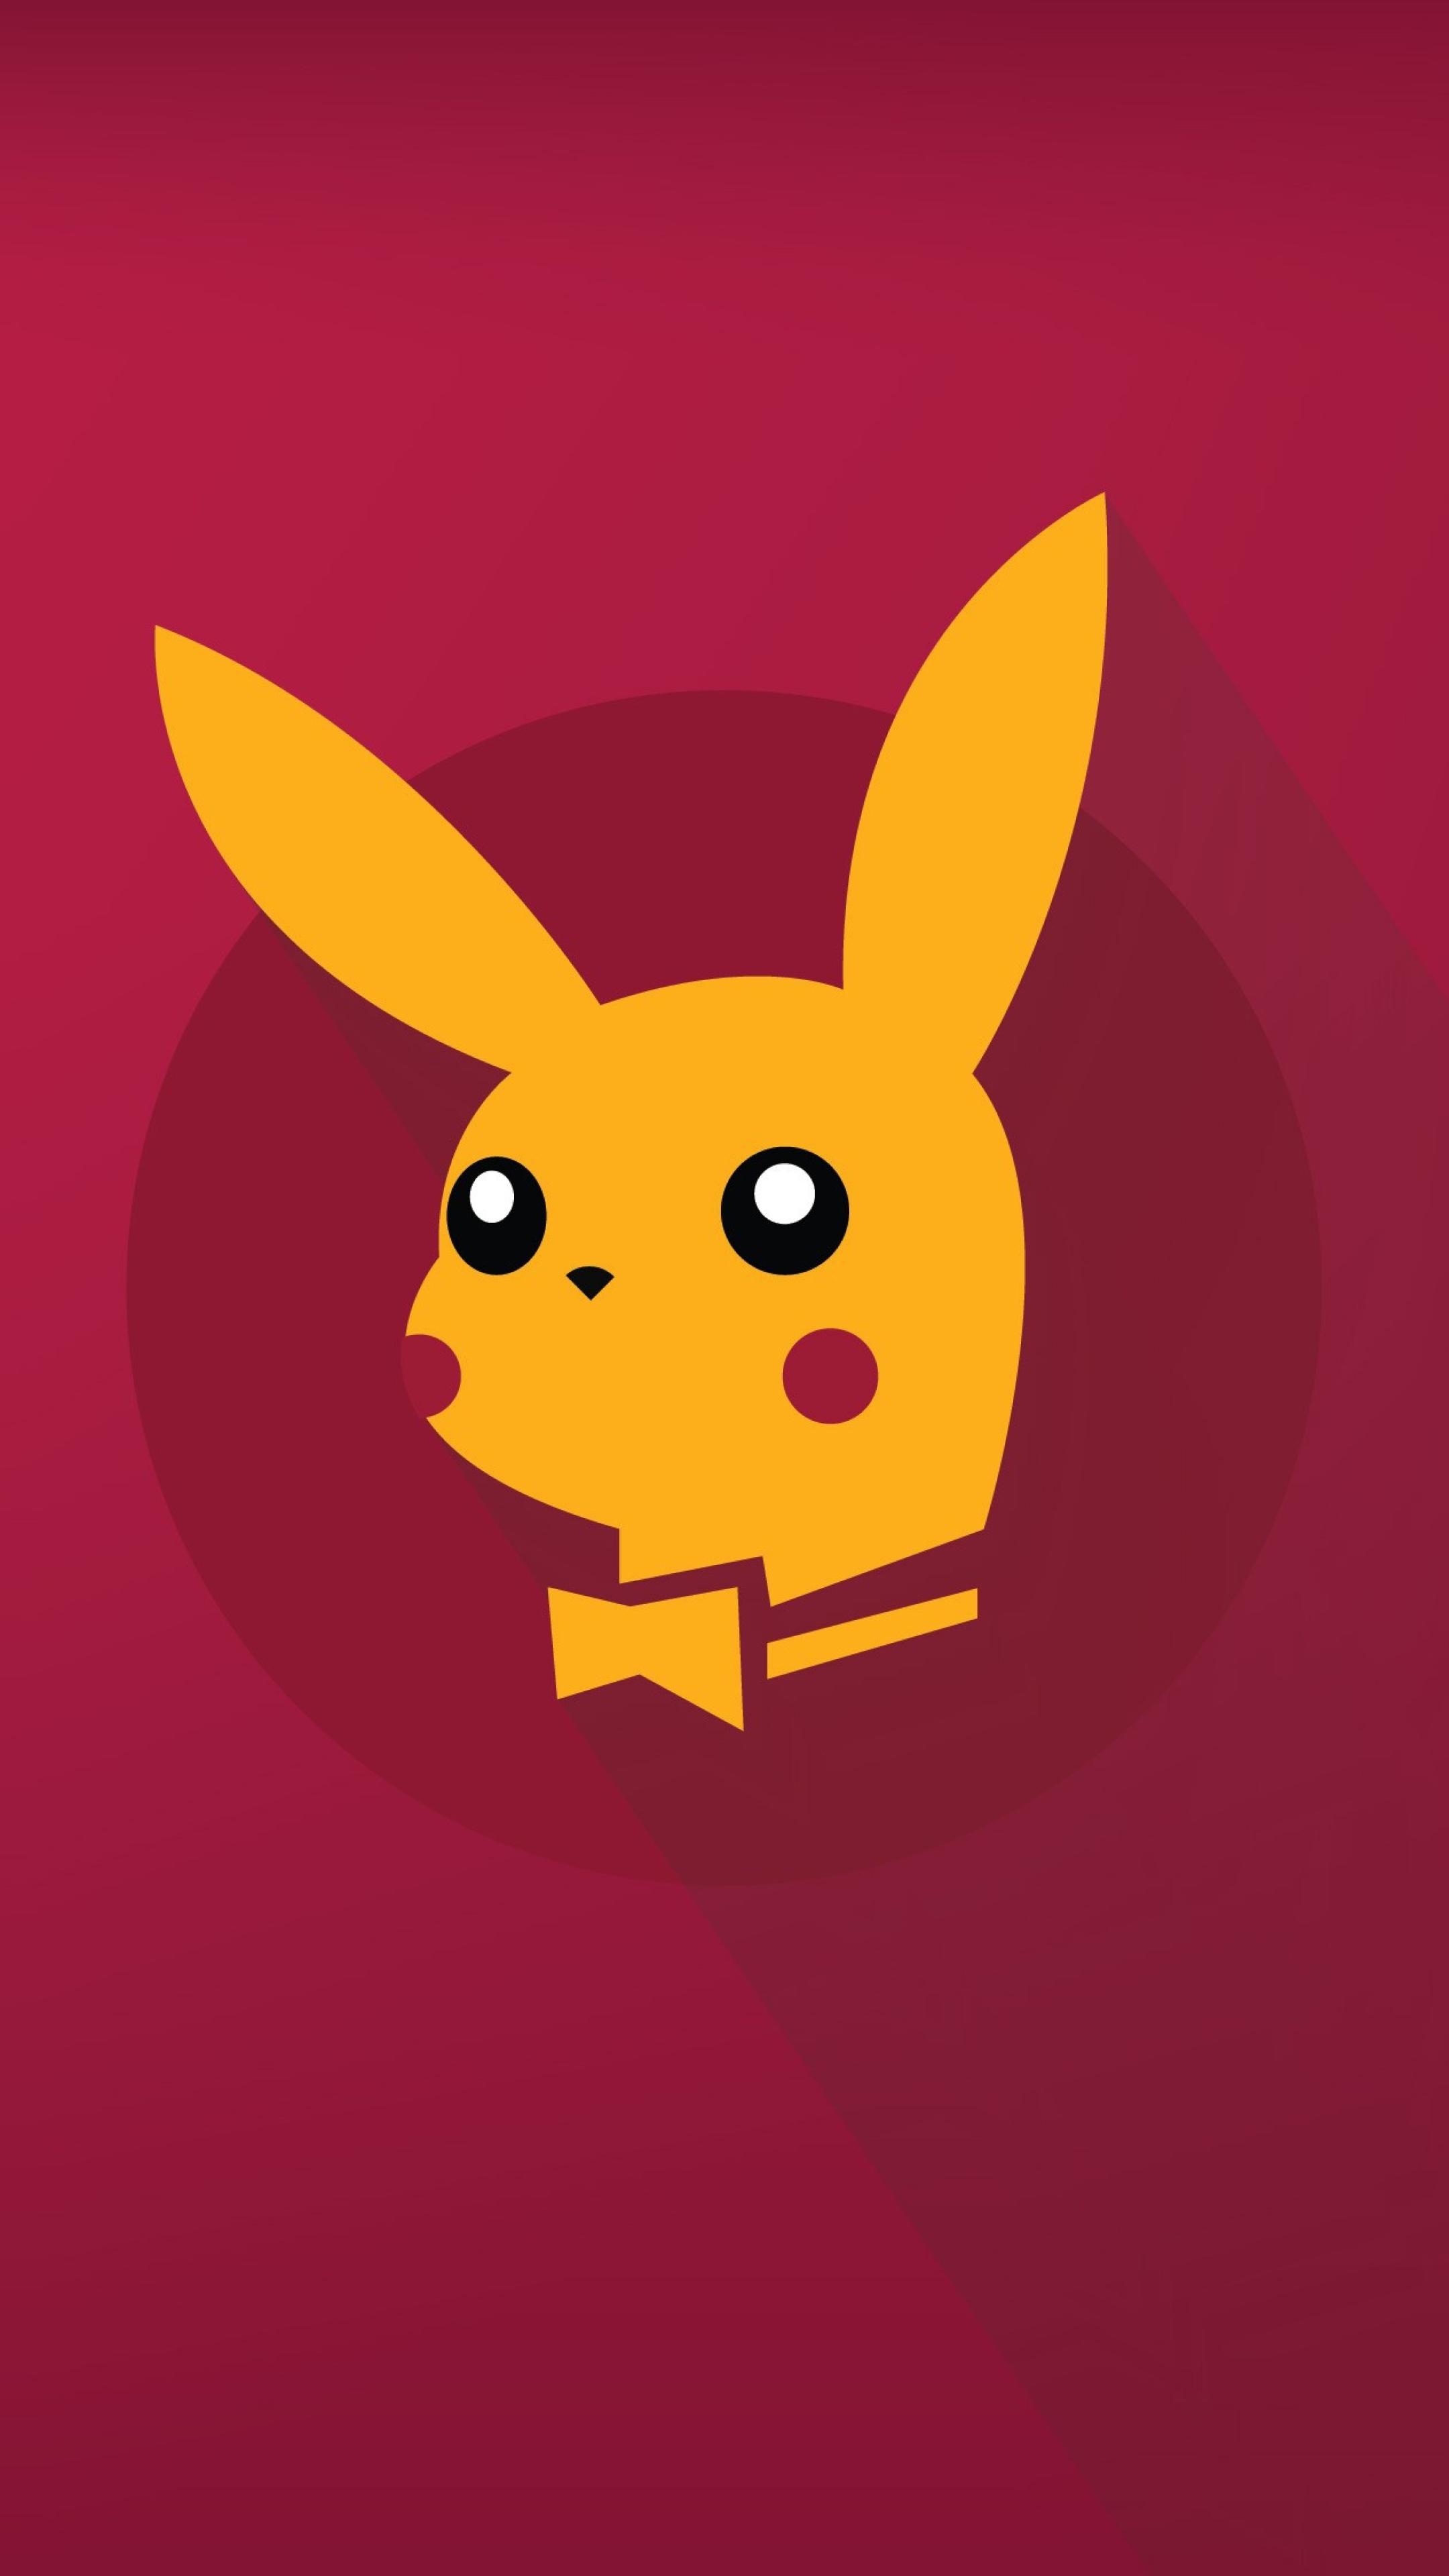 Download Pikachu Minimalist Pokémon 2560x1080 Resolution ...